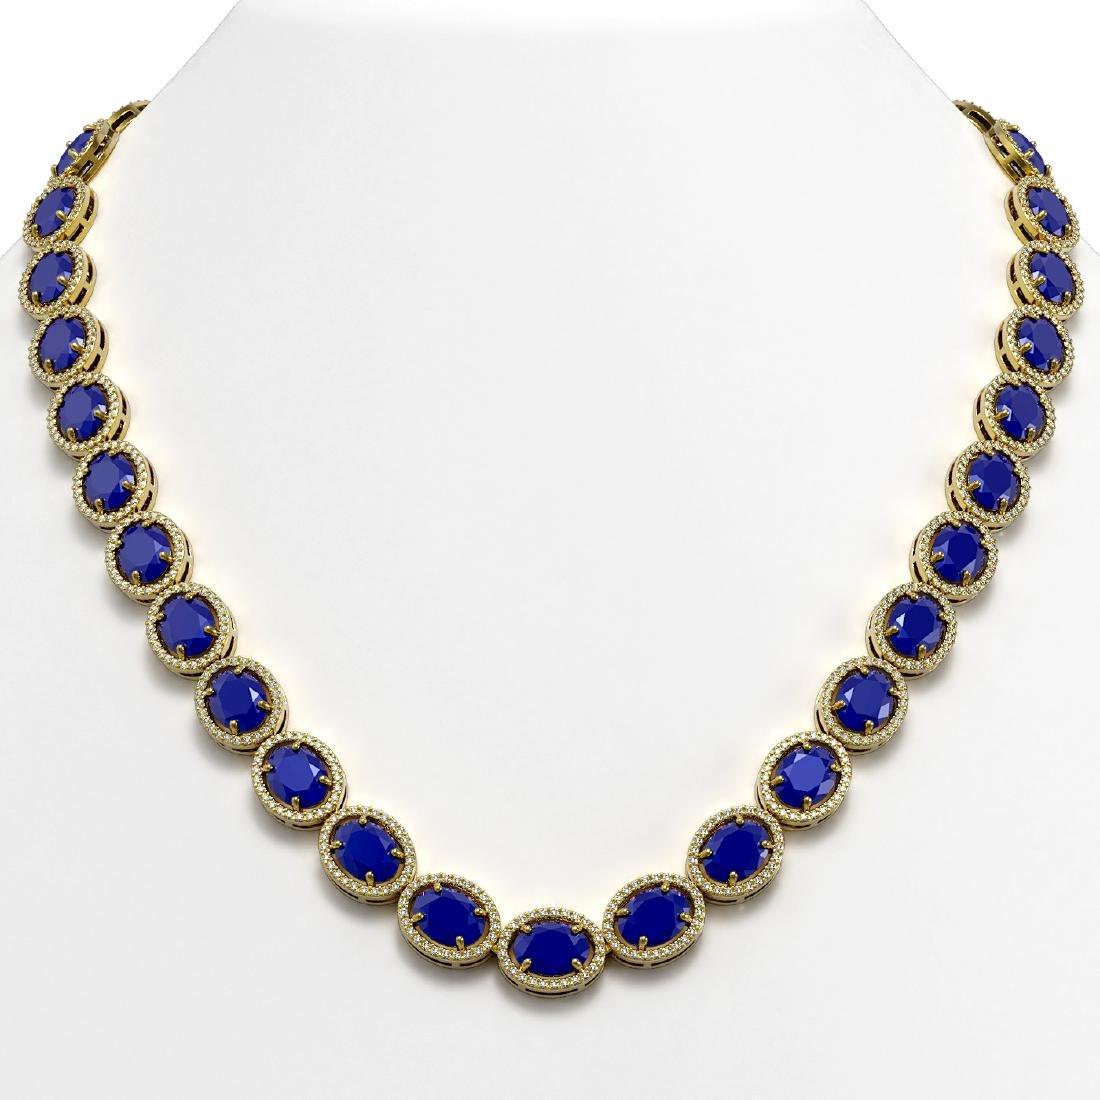 71.87 CTW Sapphire & Diamond Halo Necklace 10K Yellow